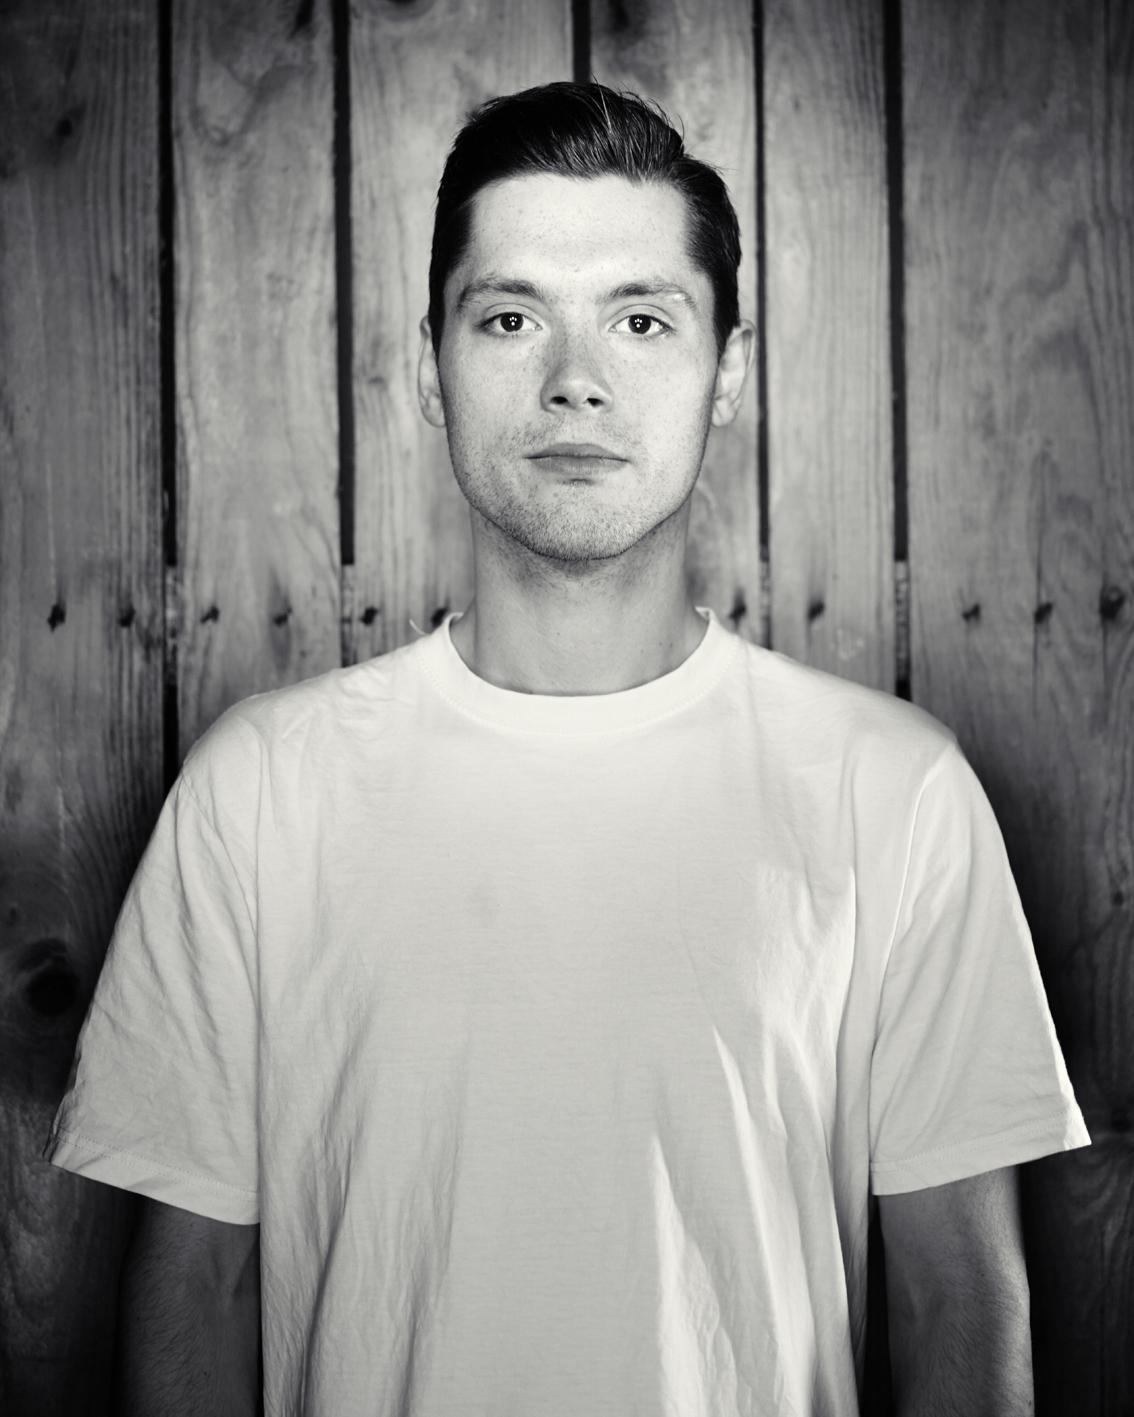 People, Portrait, Skate, Skateboarding, Hamburg, Christopher Shaw, Fotografie, Black White, Jan Fink